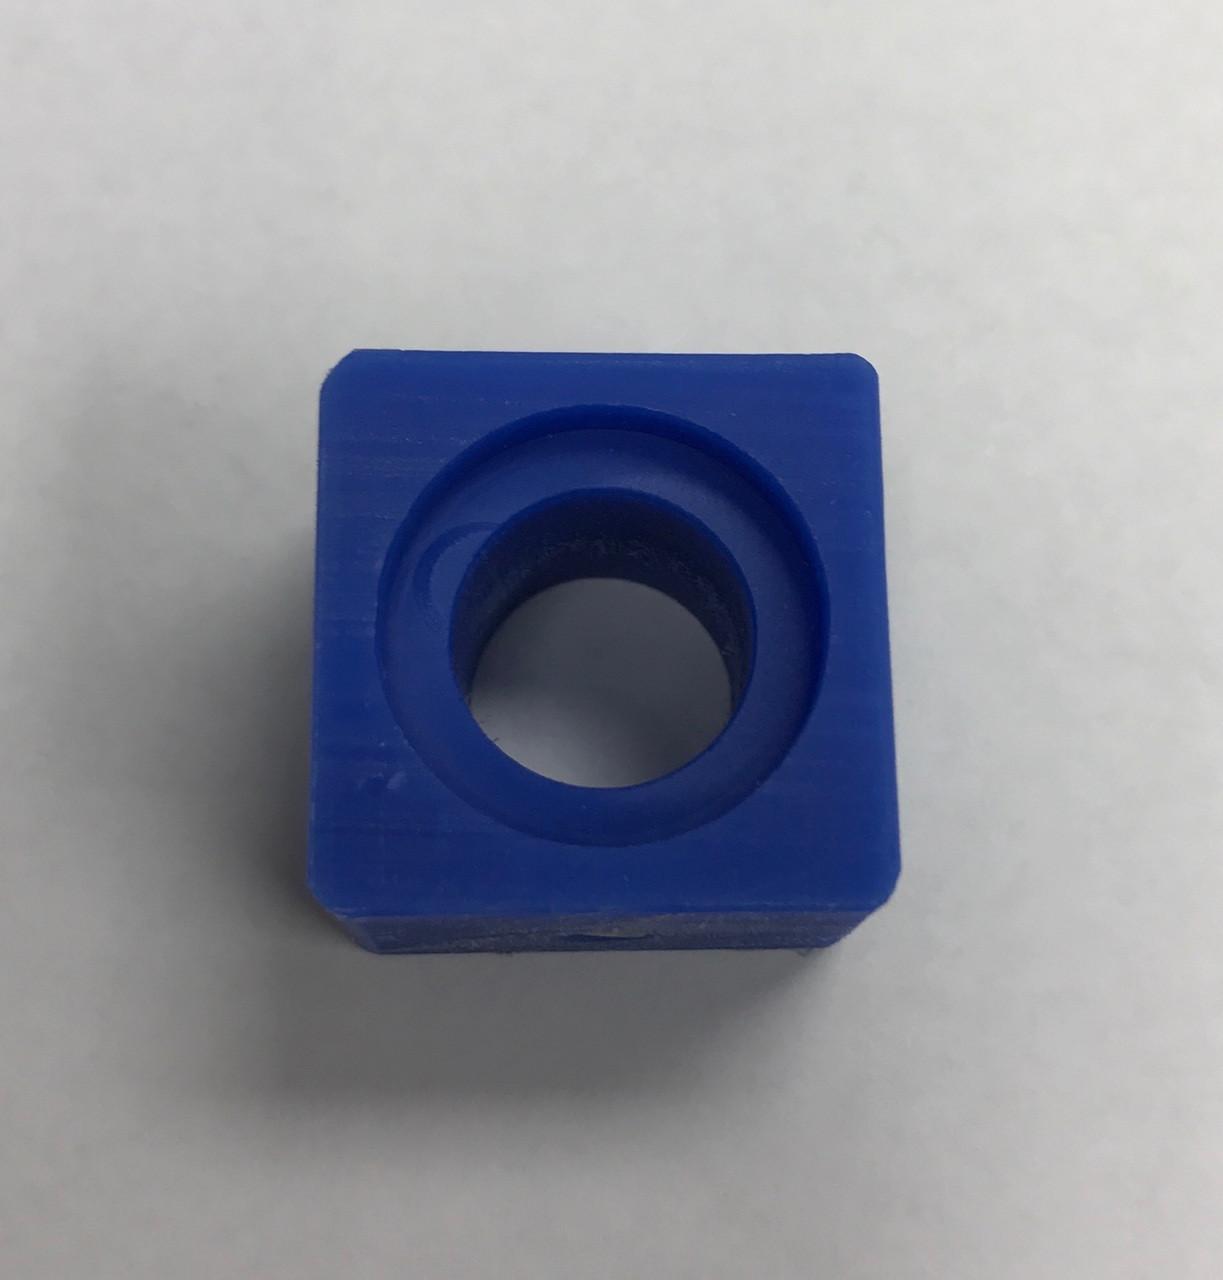 Foodlogistiks MS84.21,MS84.3,C90 & C90+ - Shoe w/Pin (Blue Square) - 1416.N280.000.02